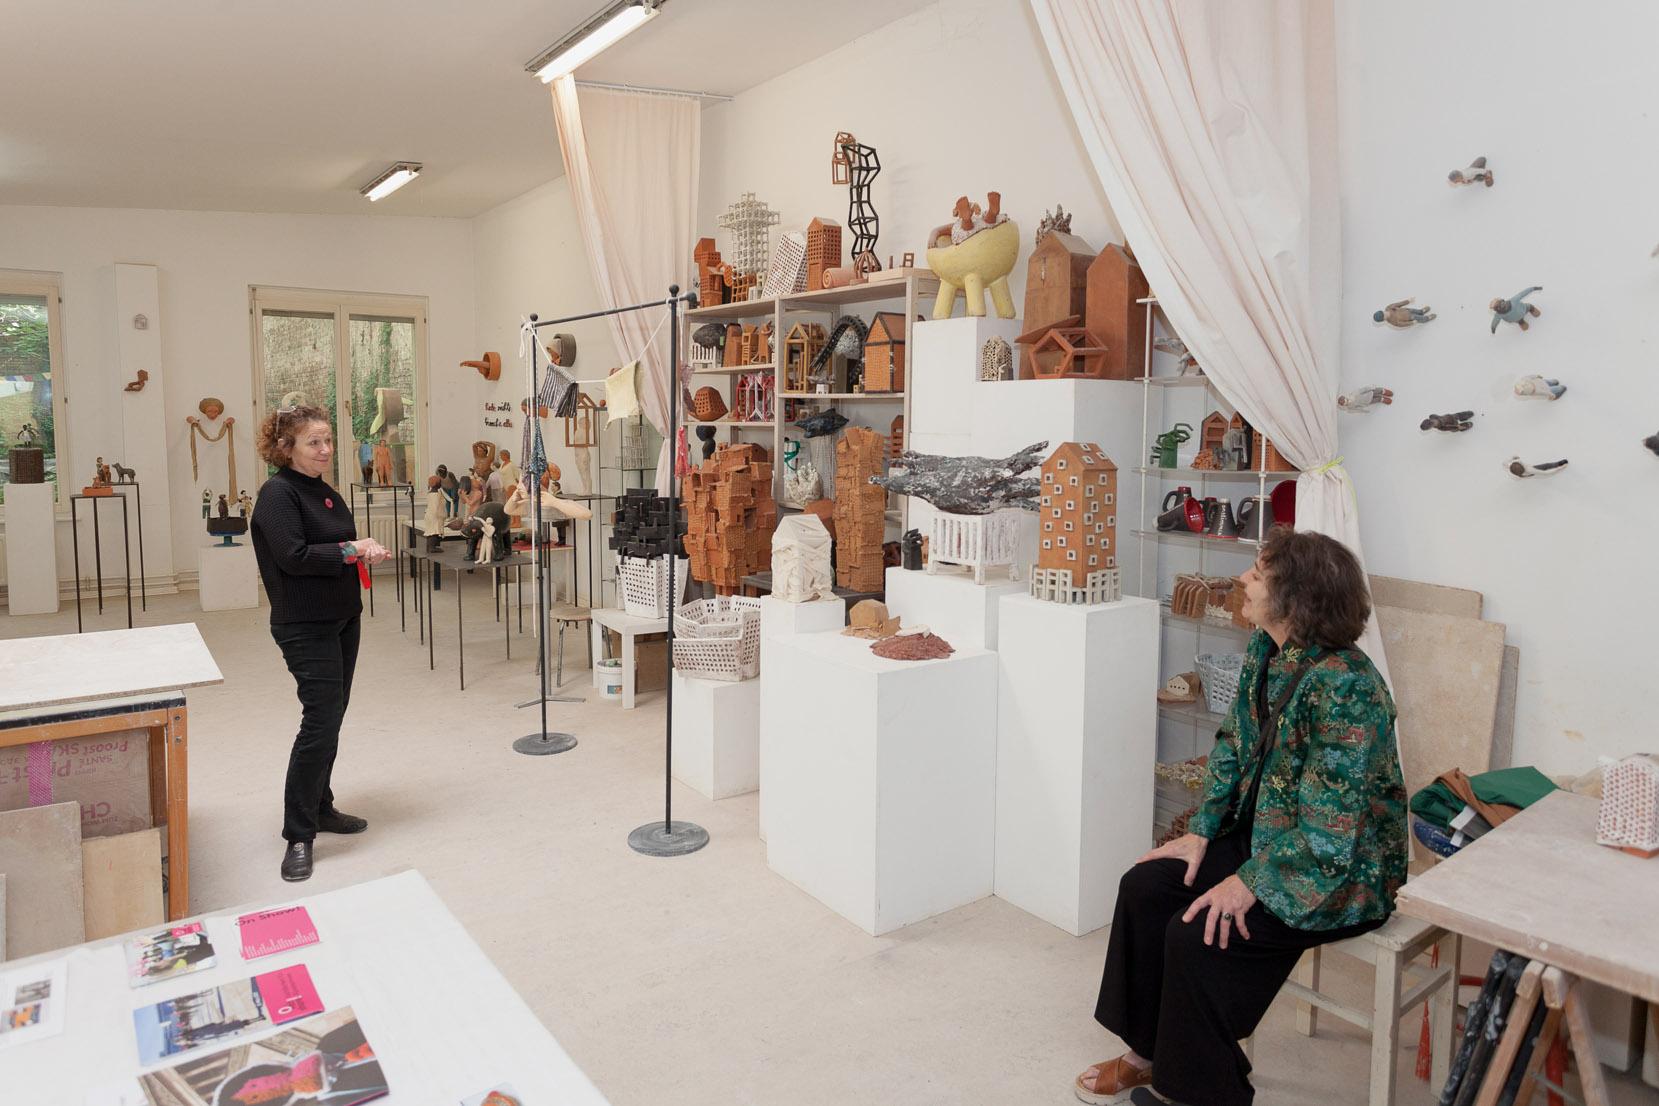 Atelierspaziergang mit Dr. Helen Adkins, Atelier Kohn